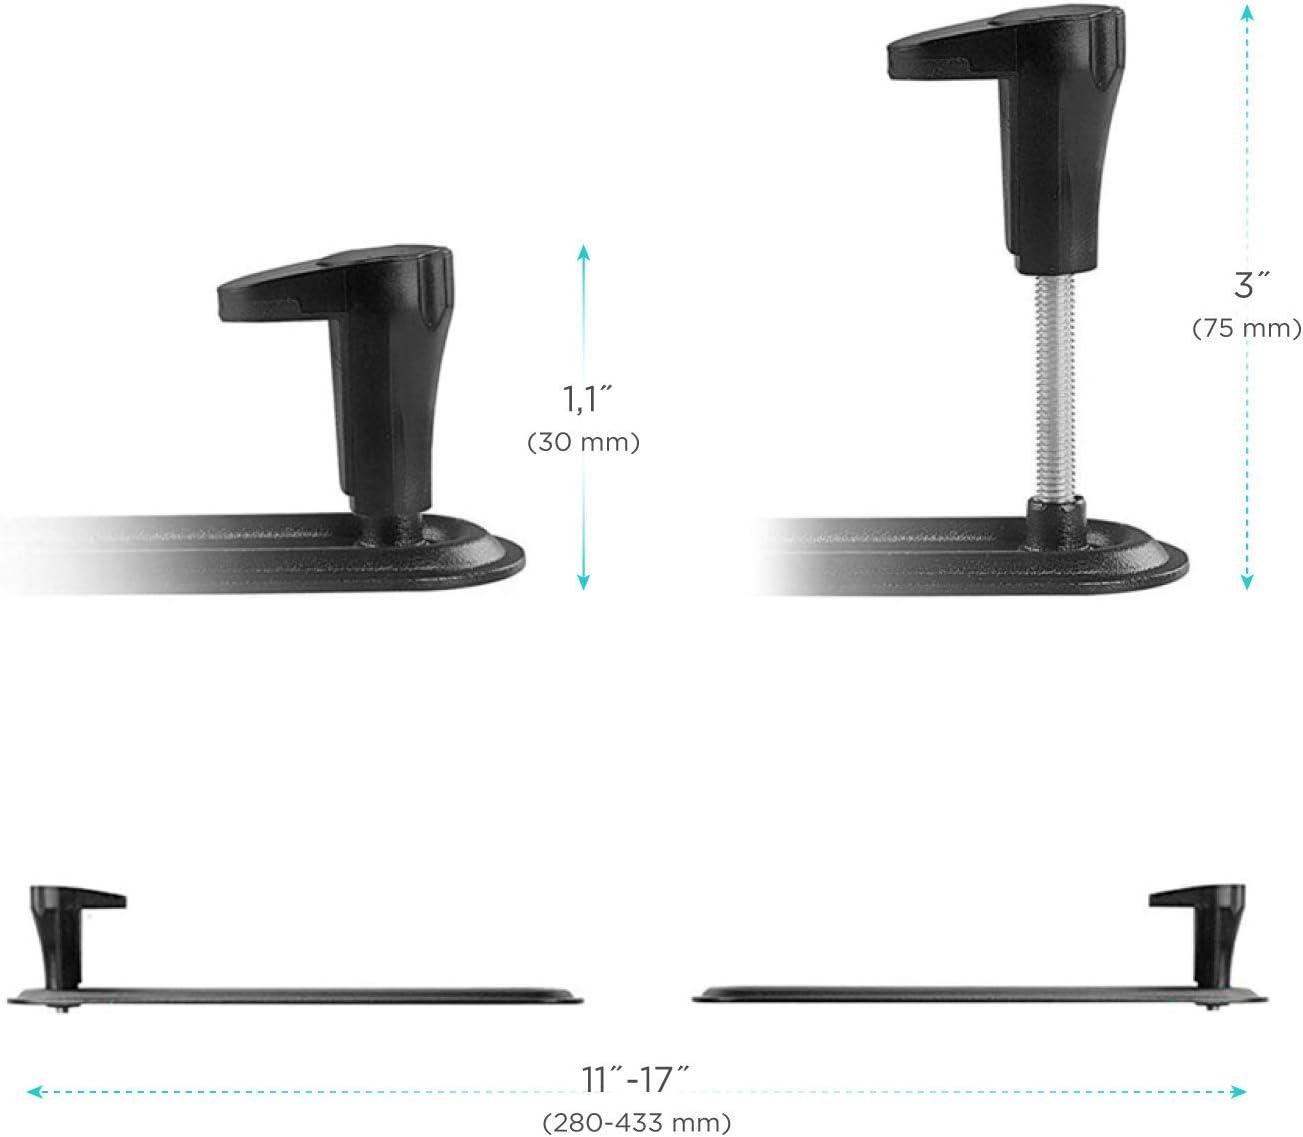 "ONKRON VESA Mount Bracket Non-VESA Monitor Arm Mounting Kit for Screen 17"" to 27- inch VESA 75x75 mm"